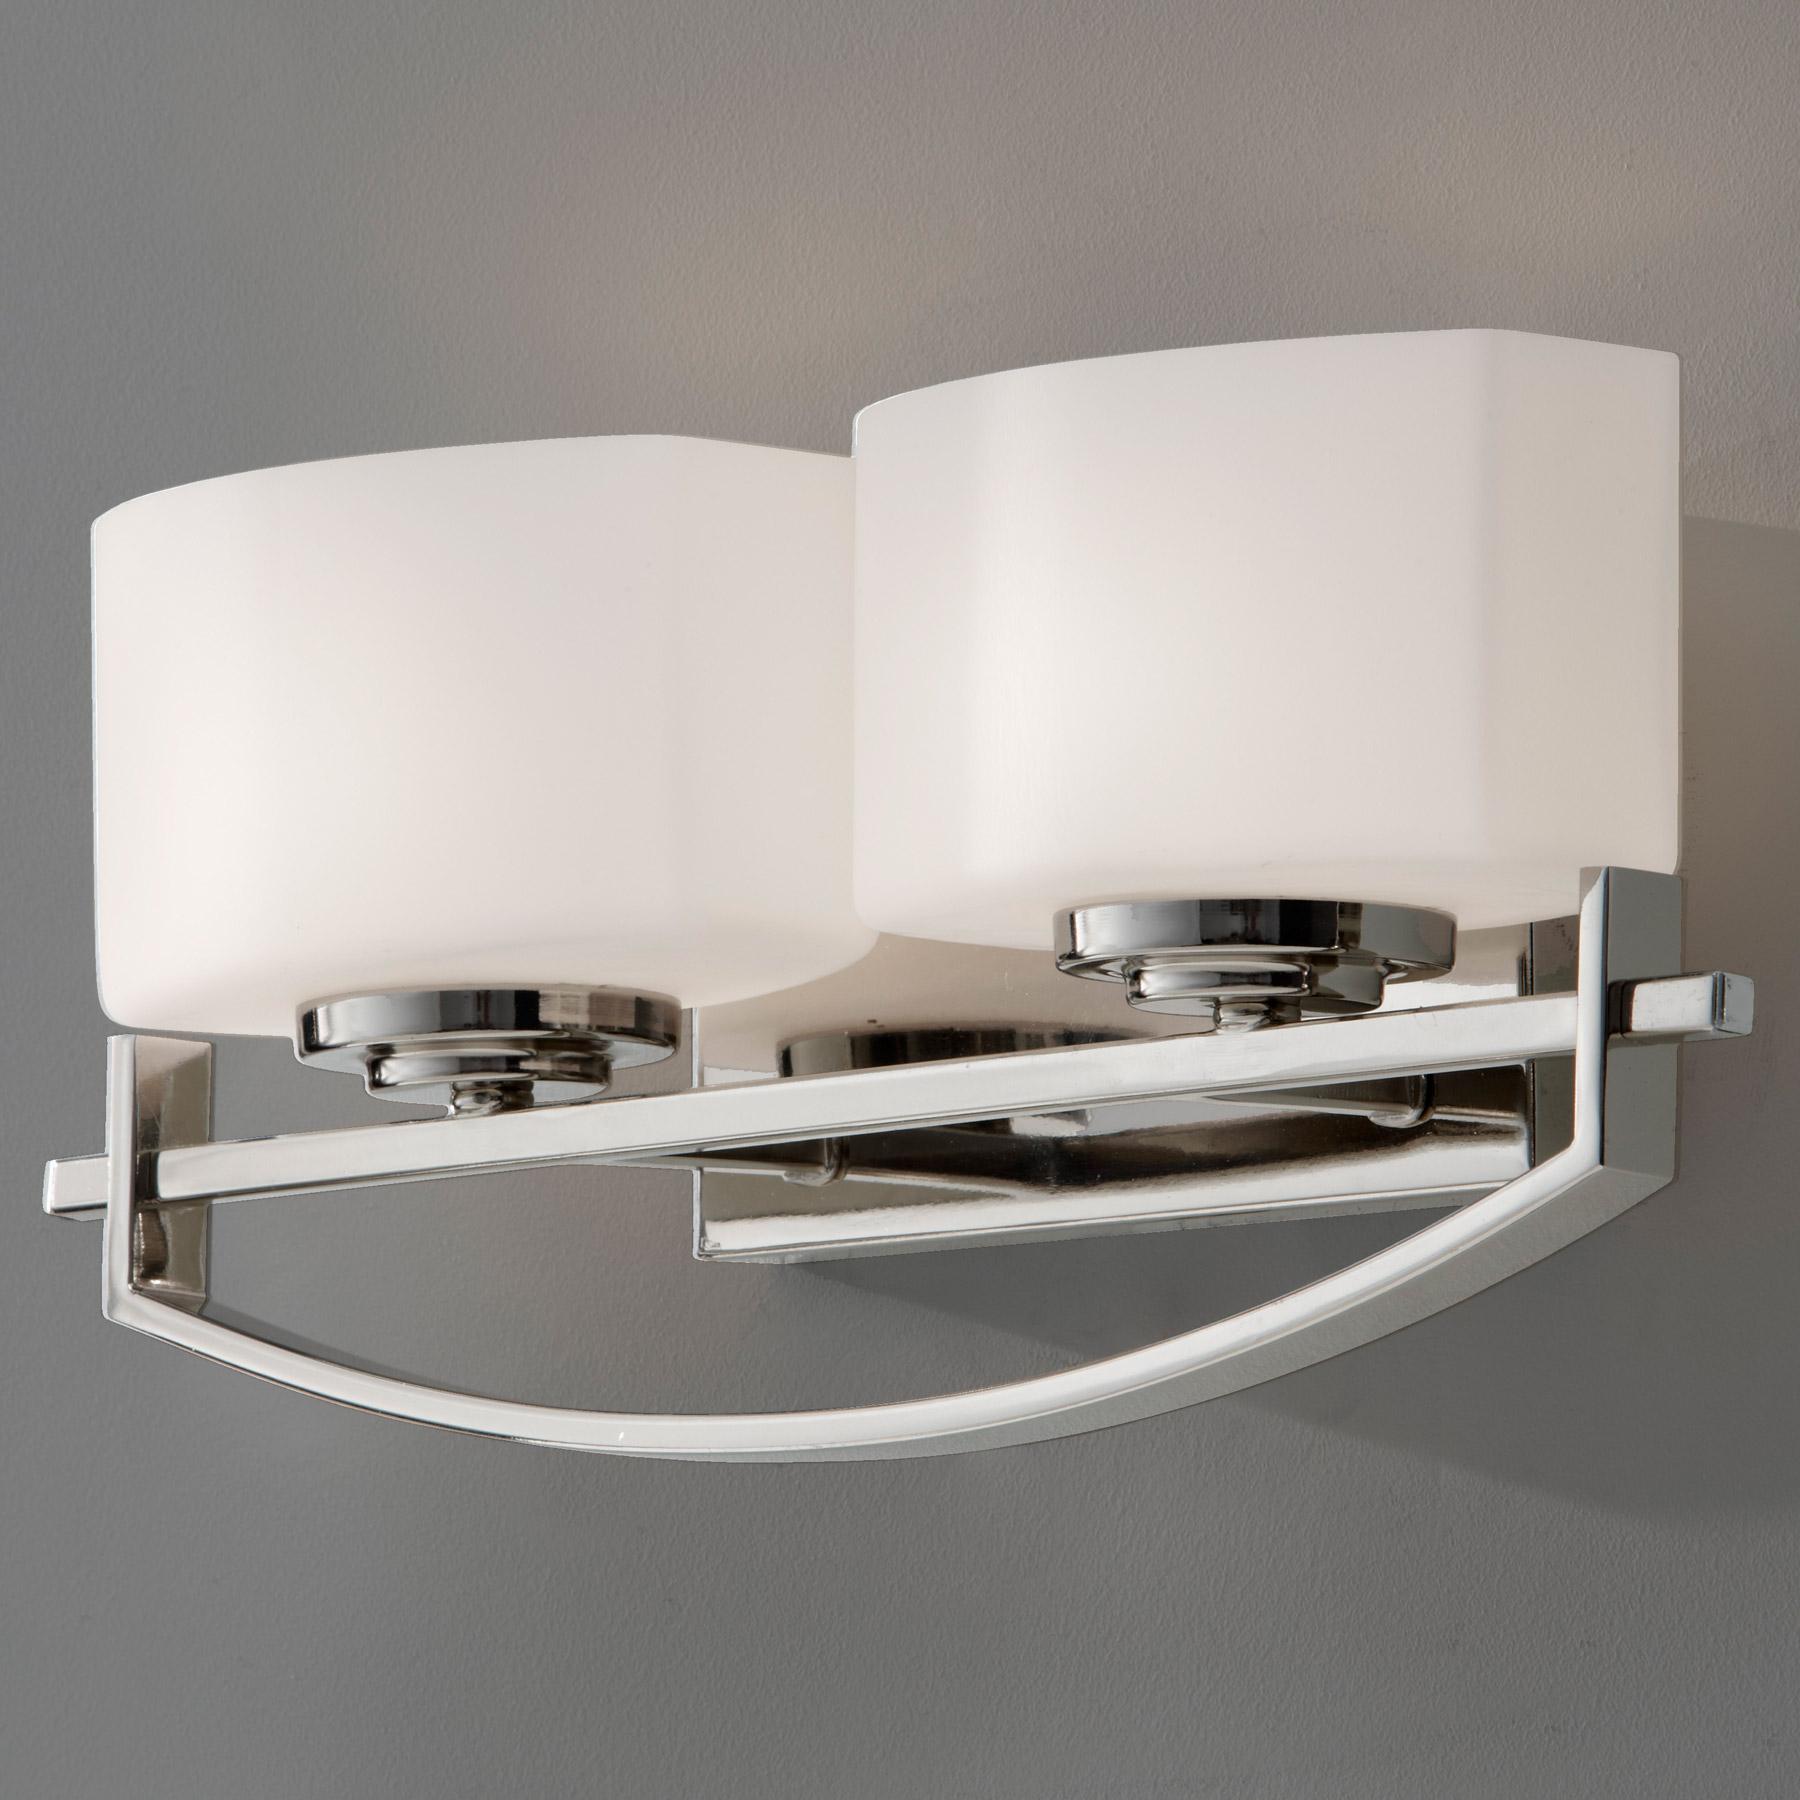 wall lighting bathroom vanity lights murray feiss vs18202 pn. Black Bedroom Furniture Sets. Home Design Ideas